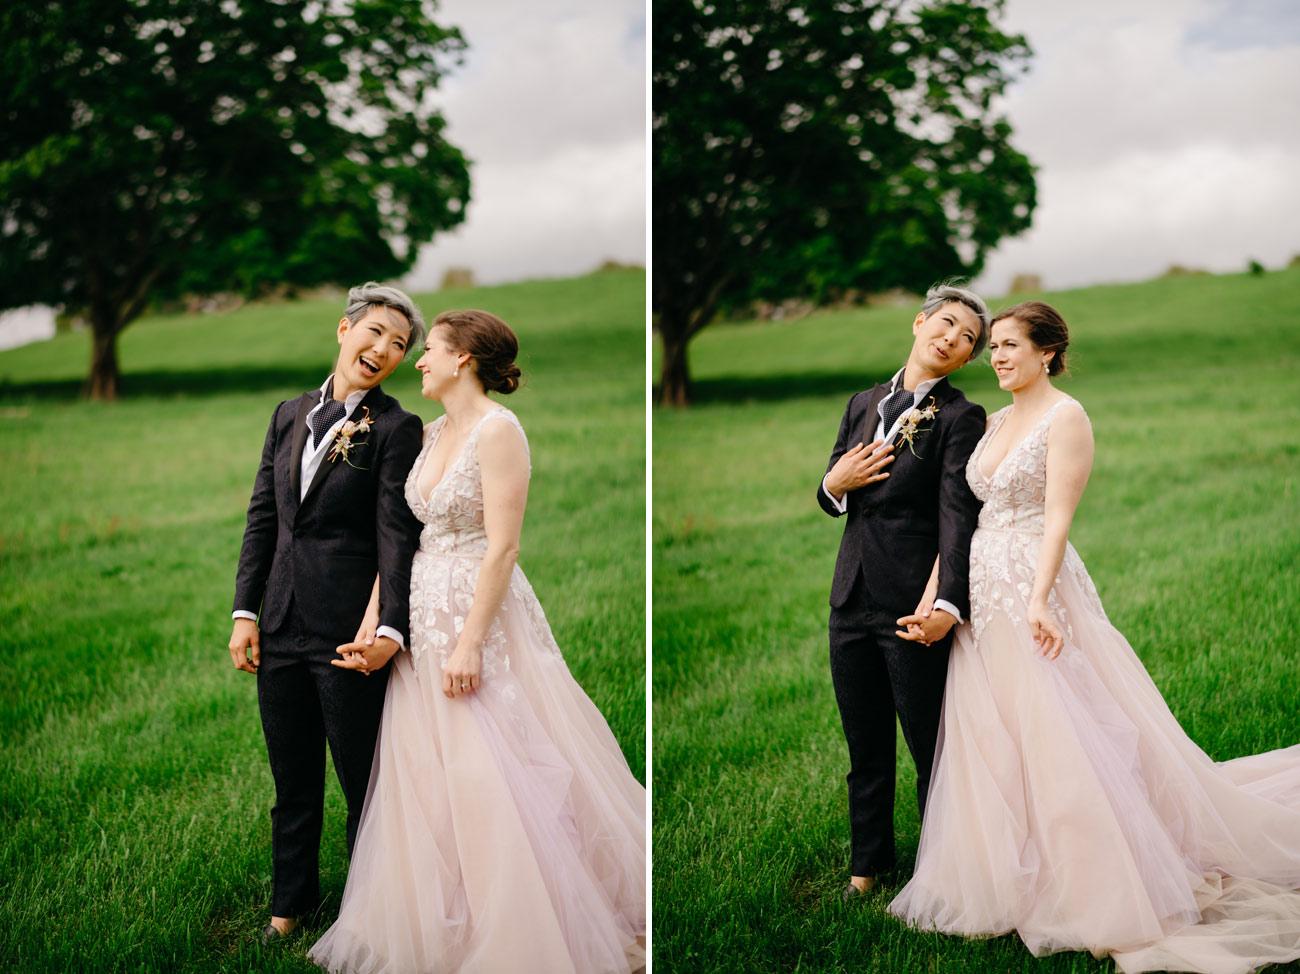 gibbet_hill_barn_same_sex_wedding_photos_33.JPG